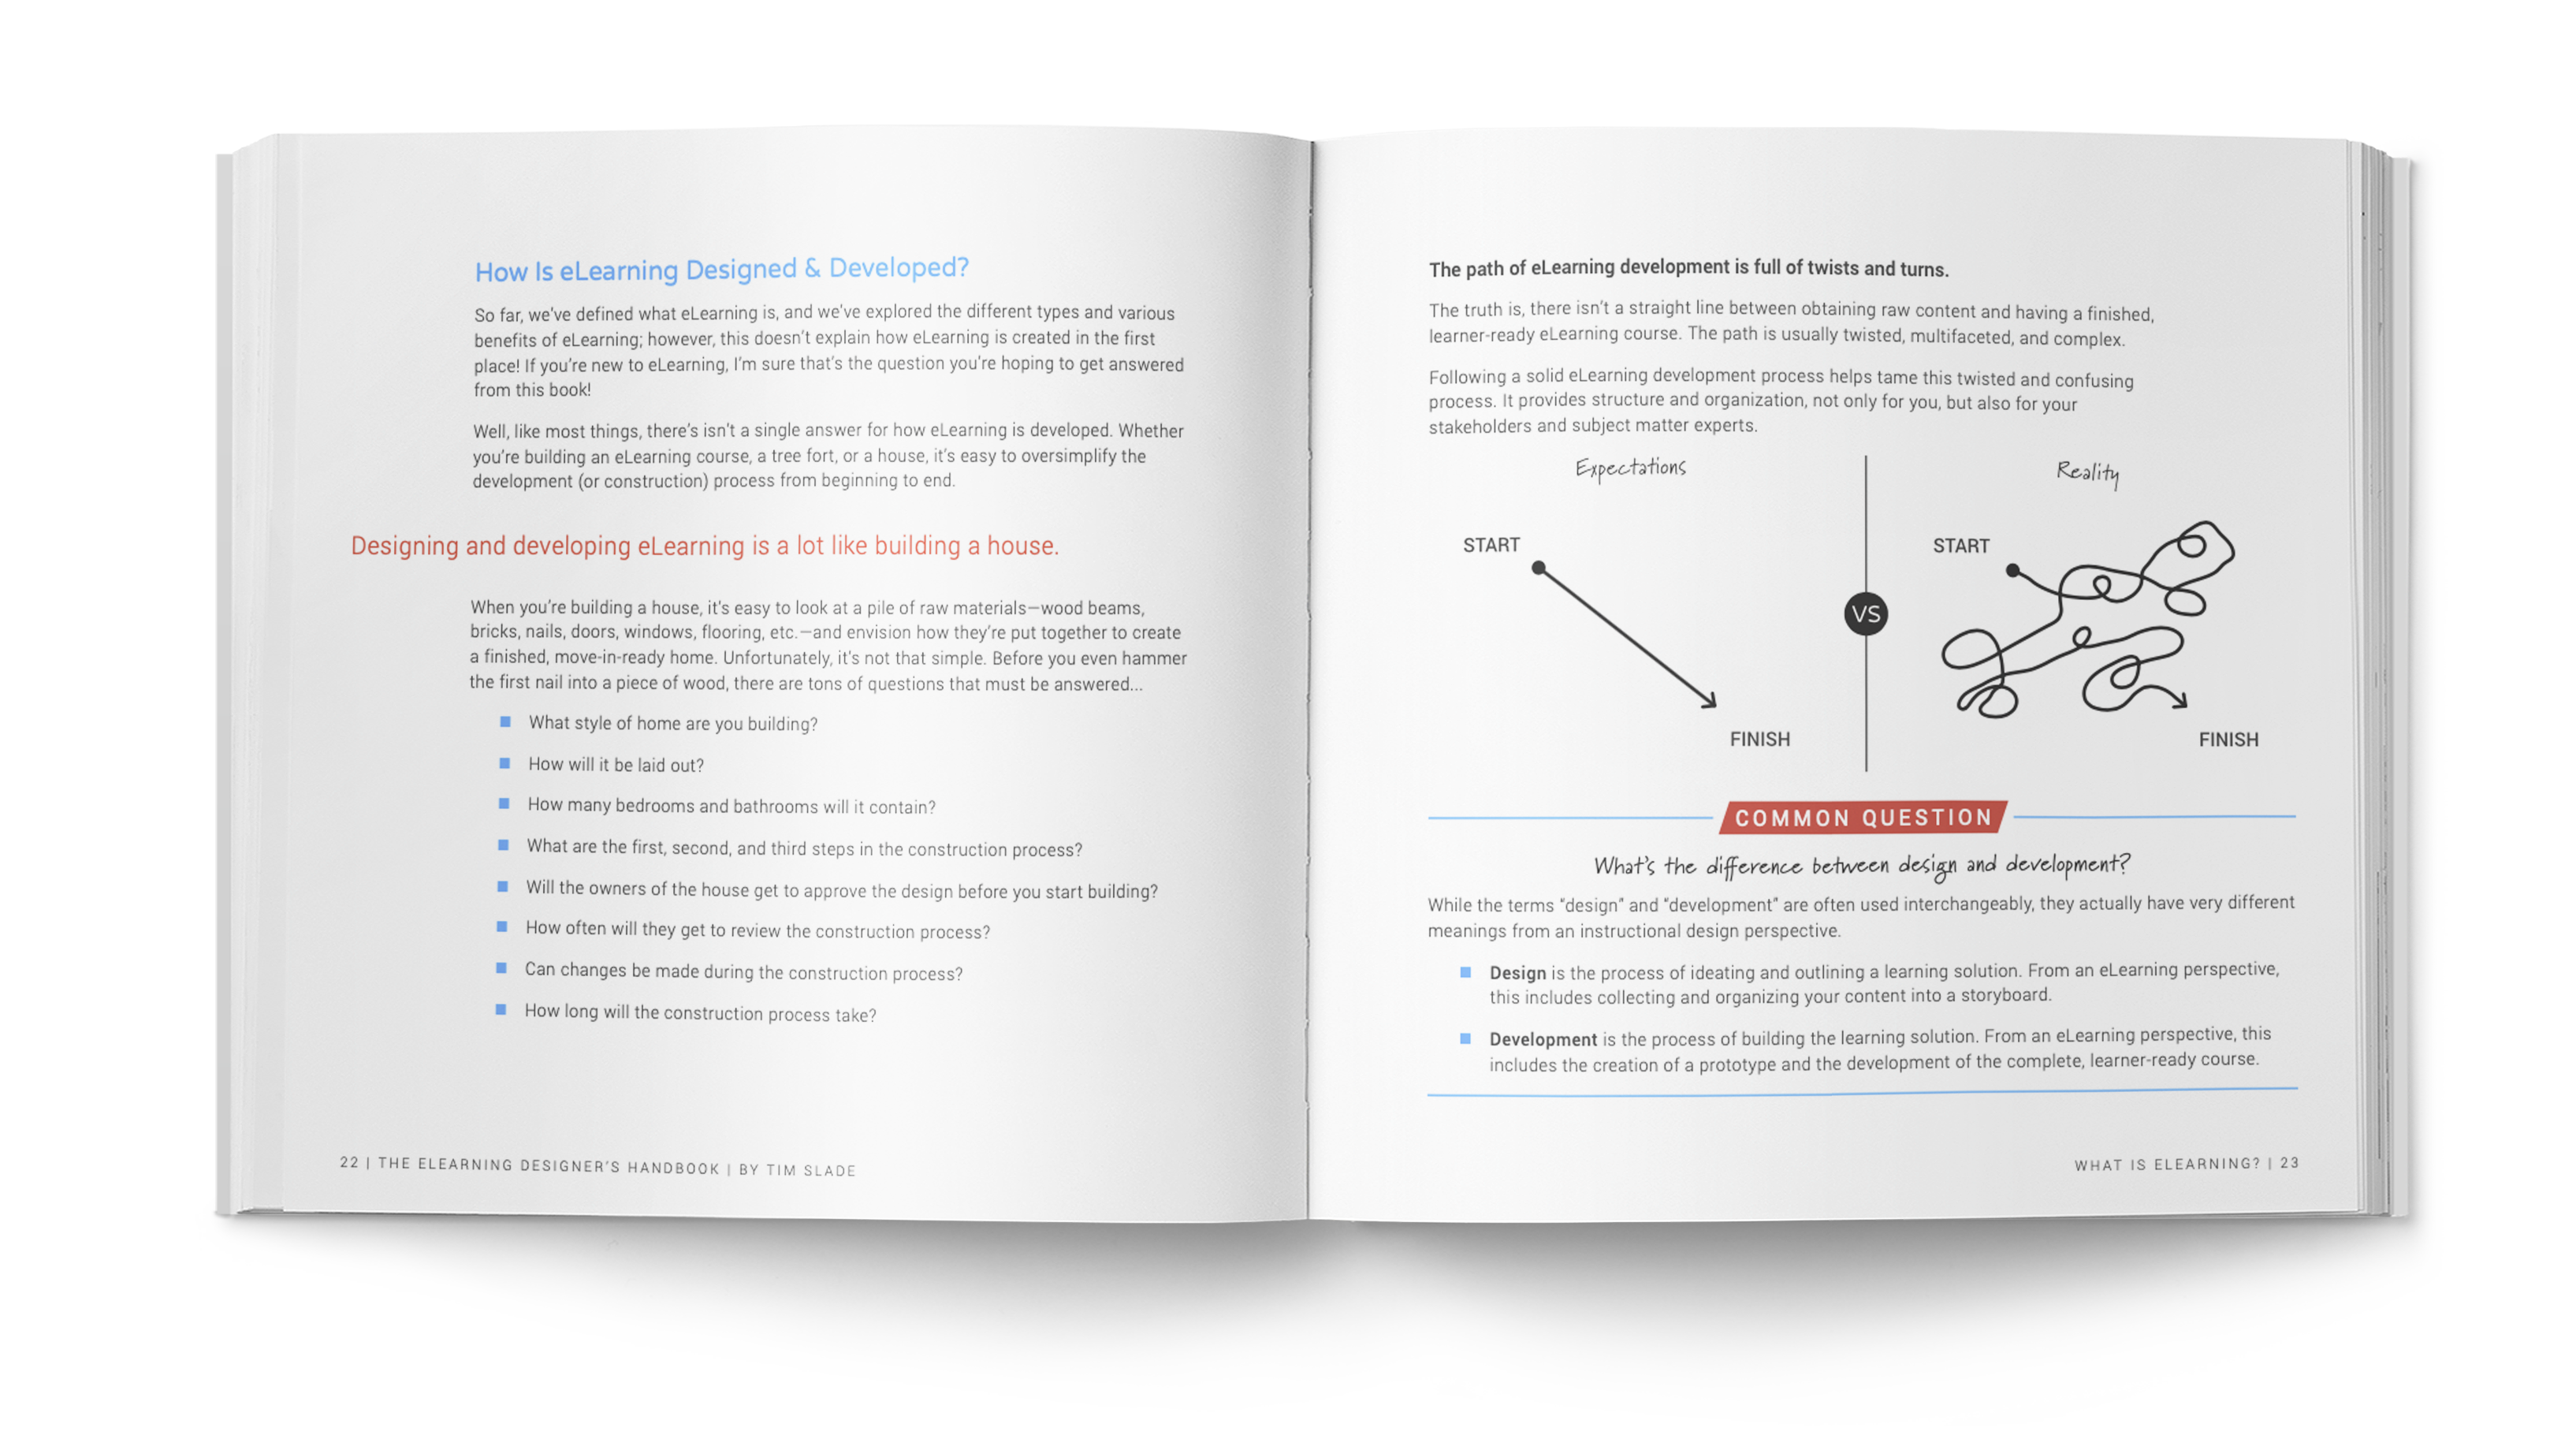 The eLearning Designer's Handbook by Tim Slade | What is eLearning? | Freelance eLearning Designer | The eLearning Designer's Academy